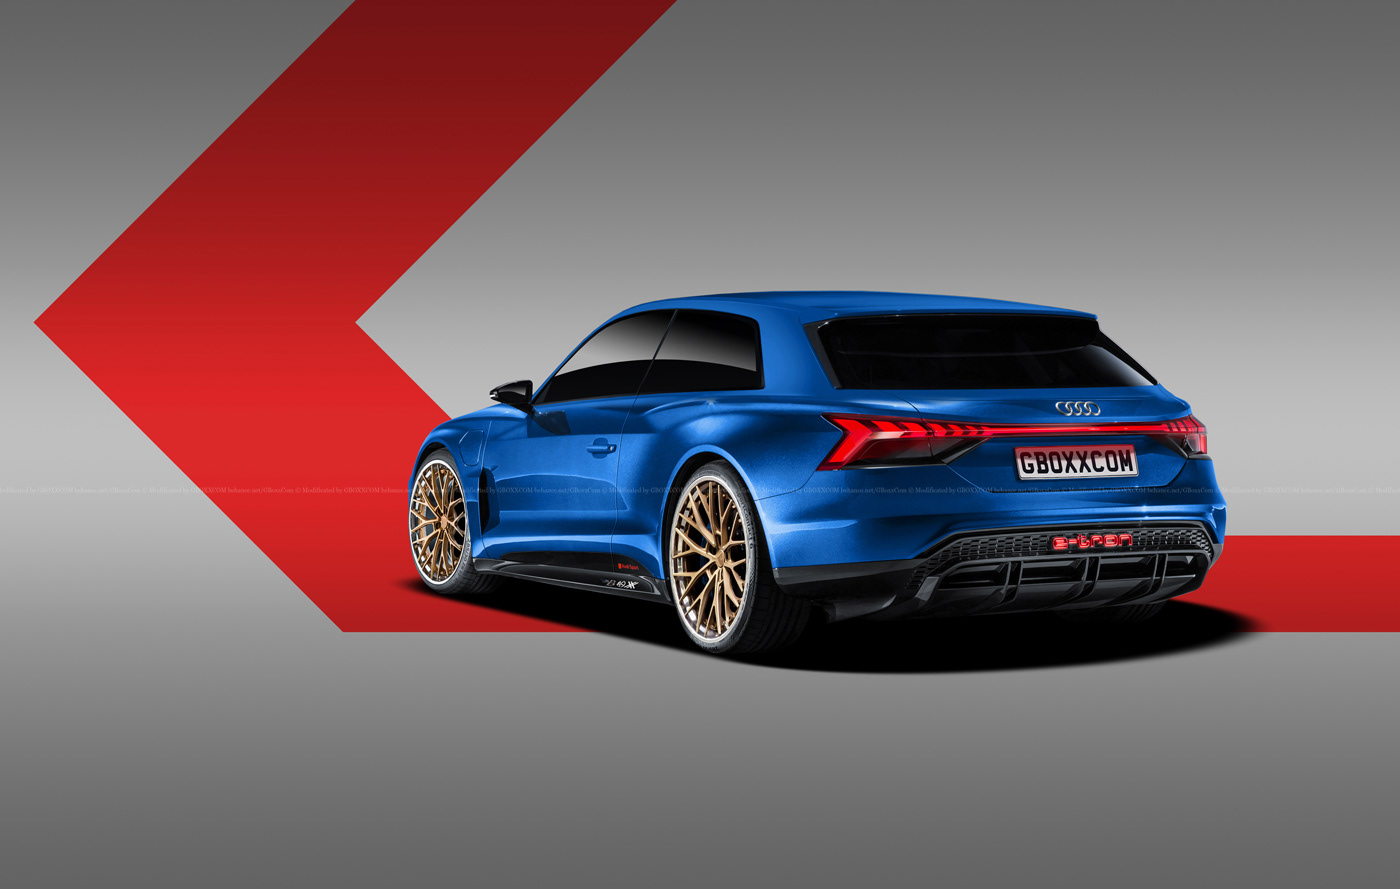 Audi E-Tron GT Spyder, E-Tron GT Wagon, E-Tron GT Coupe Renderings (9)